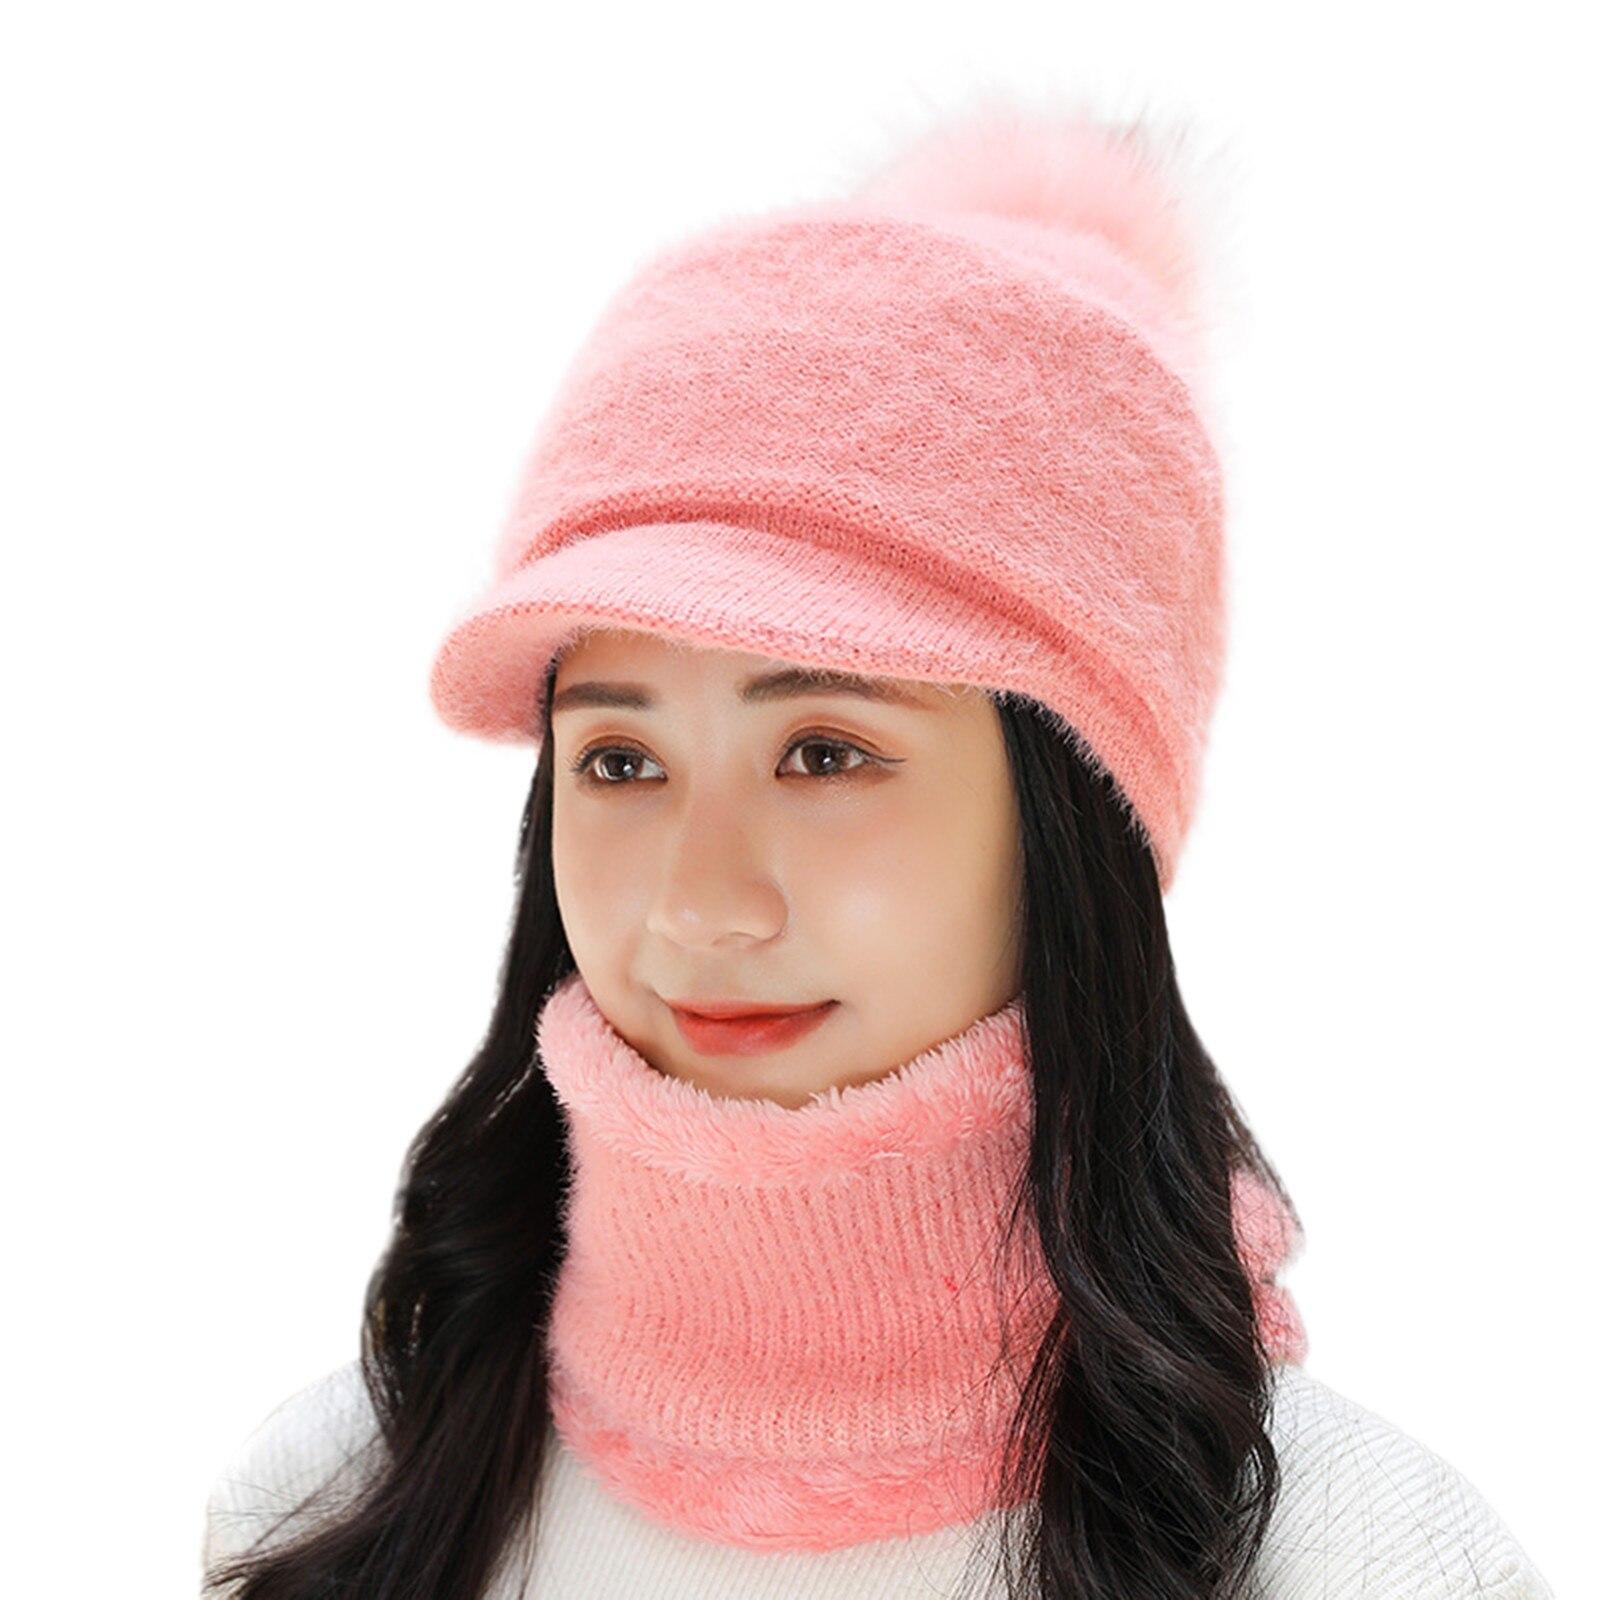 Winter Adult Woman Pompon Hat Winter Warm Knit Solid Color Crochet Visor Cap Scarf Outdoor High Bun Cap Neckerchief Set #YJ